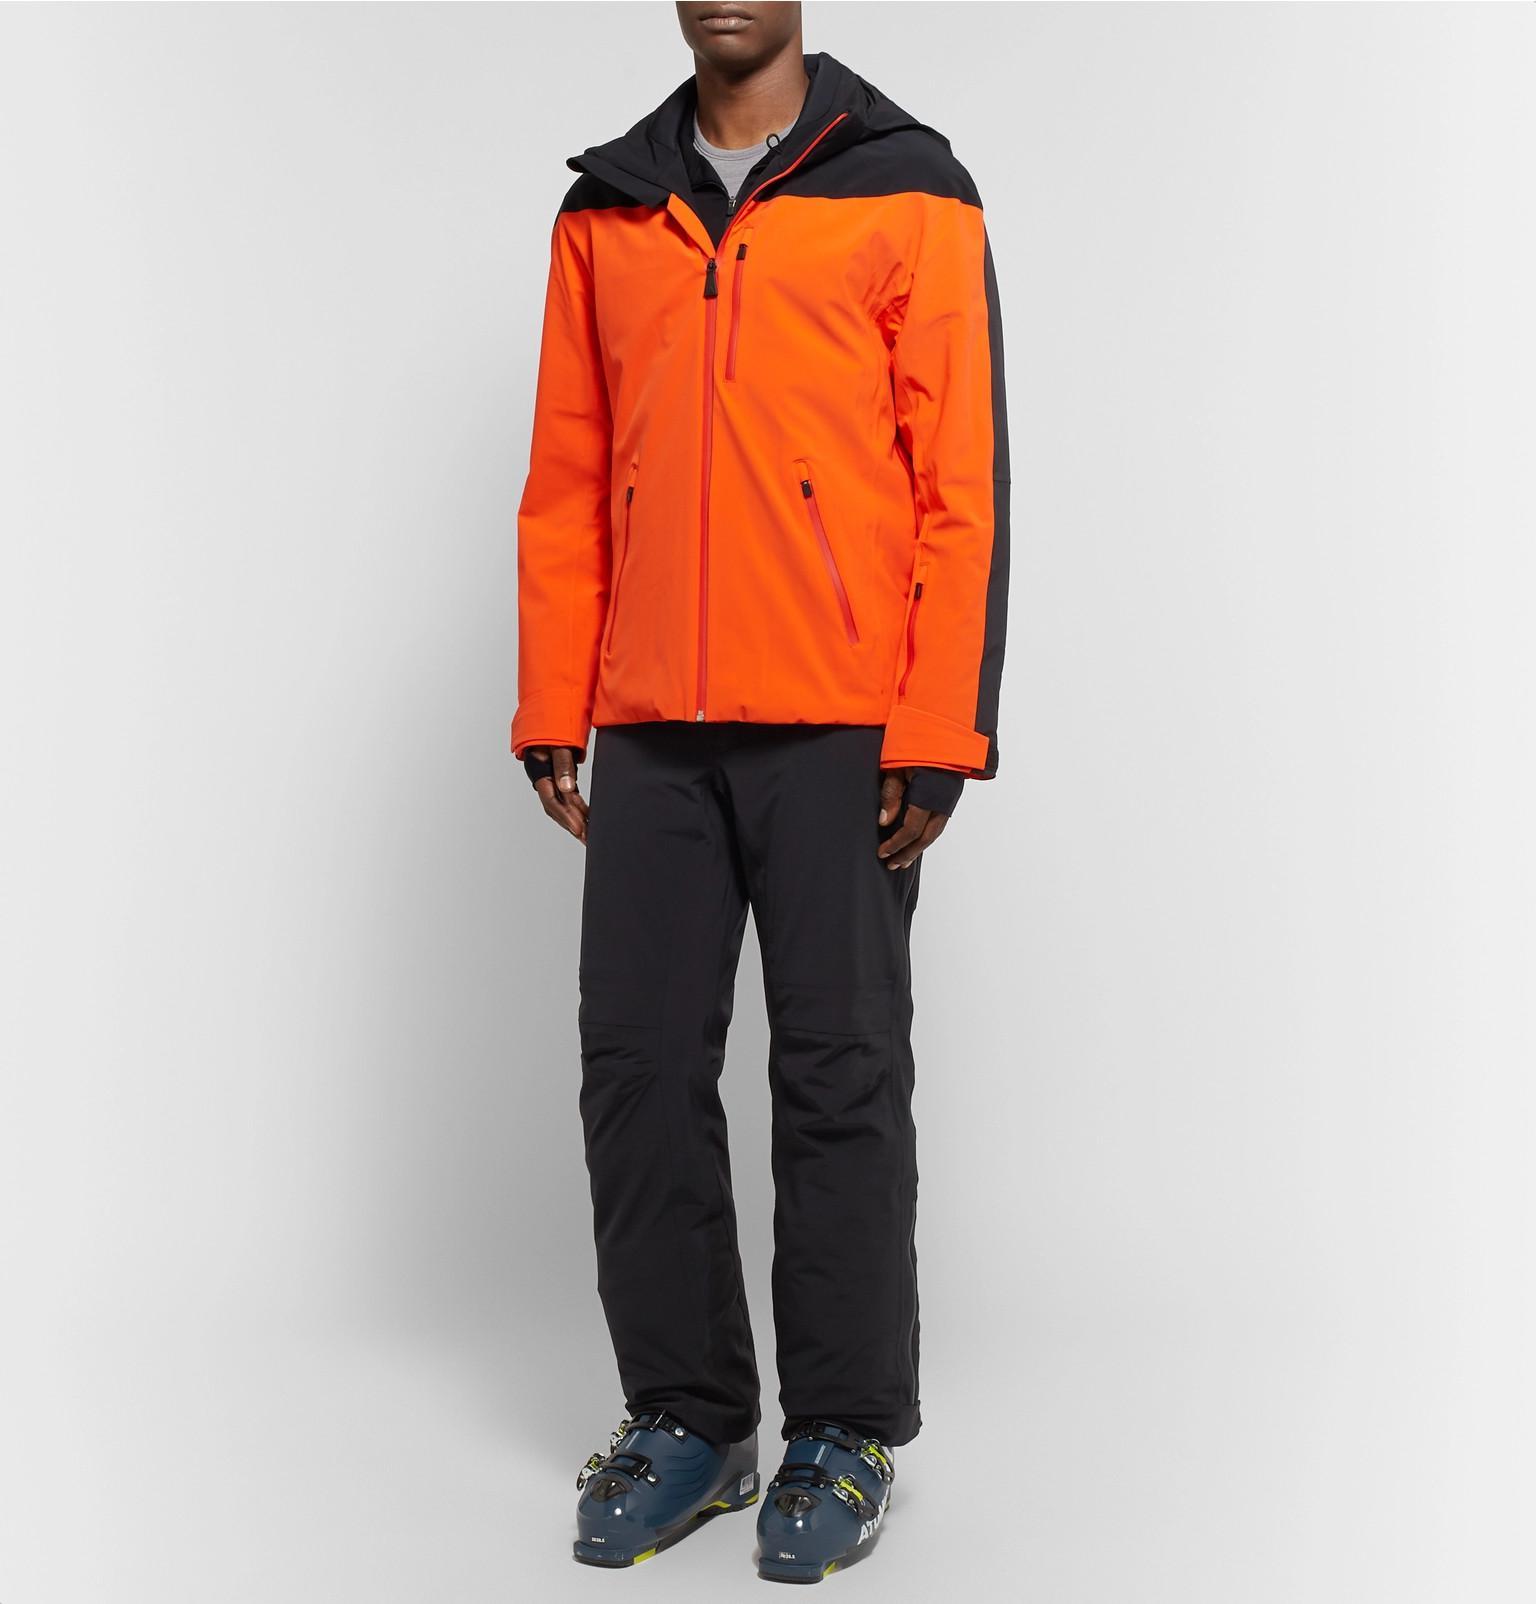 68534193e9c5 Falke Maximum Warm Stretch-jersey Tights in Black for Men - Lyst